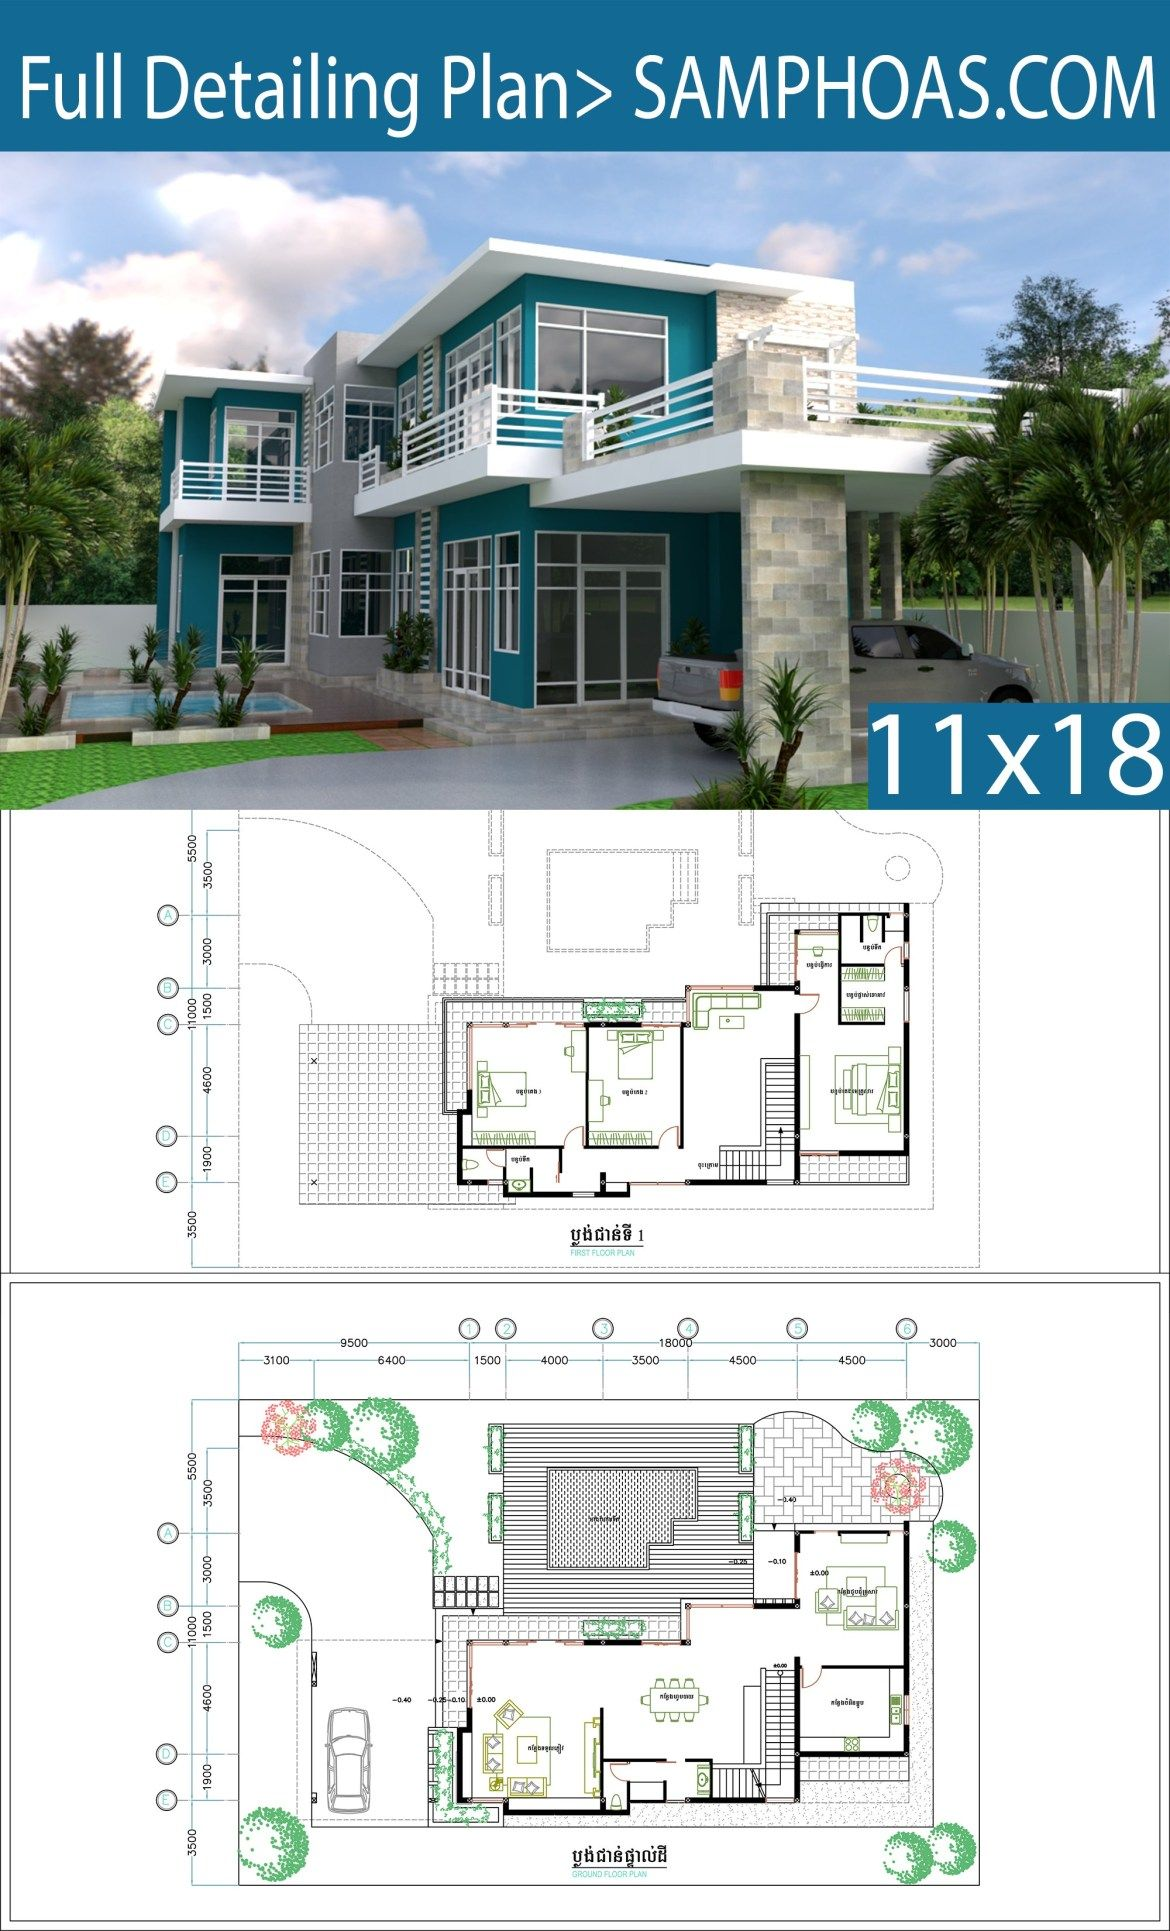 3 Bedrooms Villa Design Plan 11x18m Samphoas Plansearch Villa Design Home Design Plans House Design